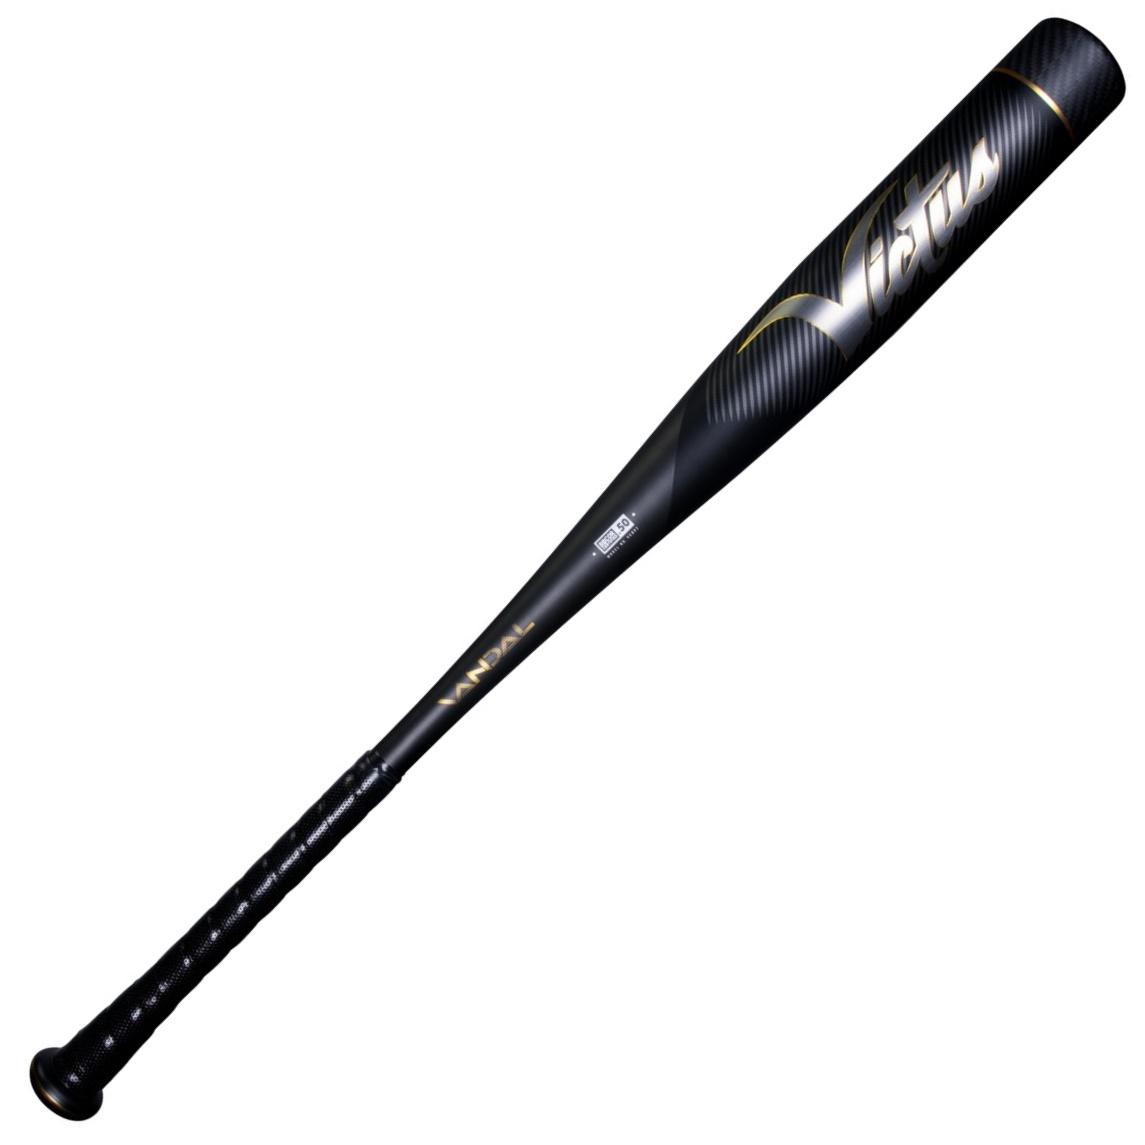 victus-vandal-2-10-baseball-bat-30-inch-20-oz VSBV2X10-3020   <ul class=a-unordered-list a-vertical a-spacing-mini> <li><span class=a-list-item>Ringless barrel design made of multi-variable